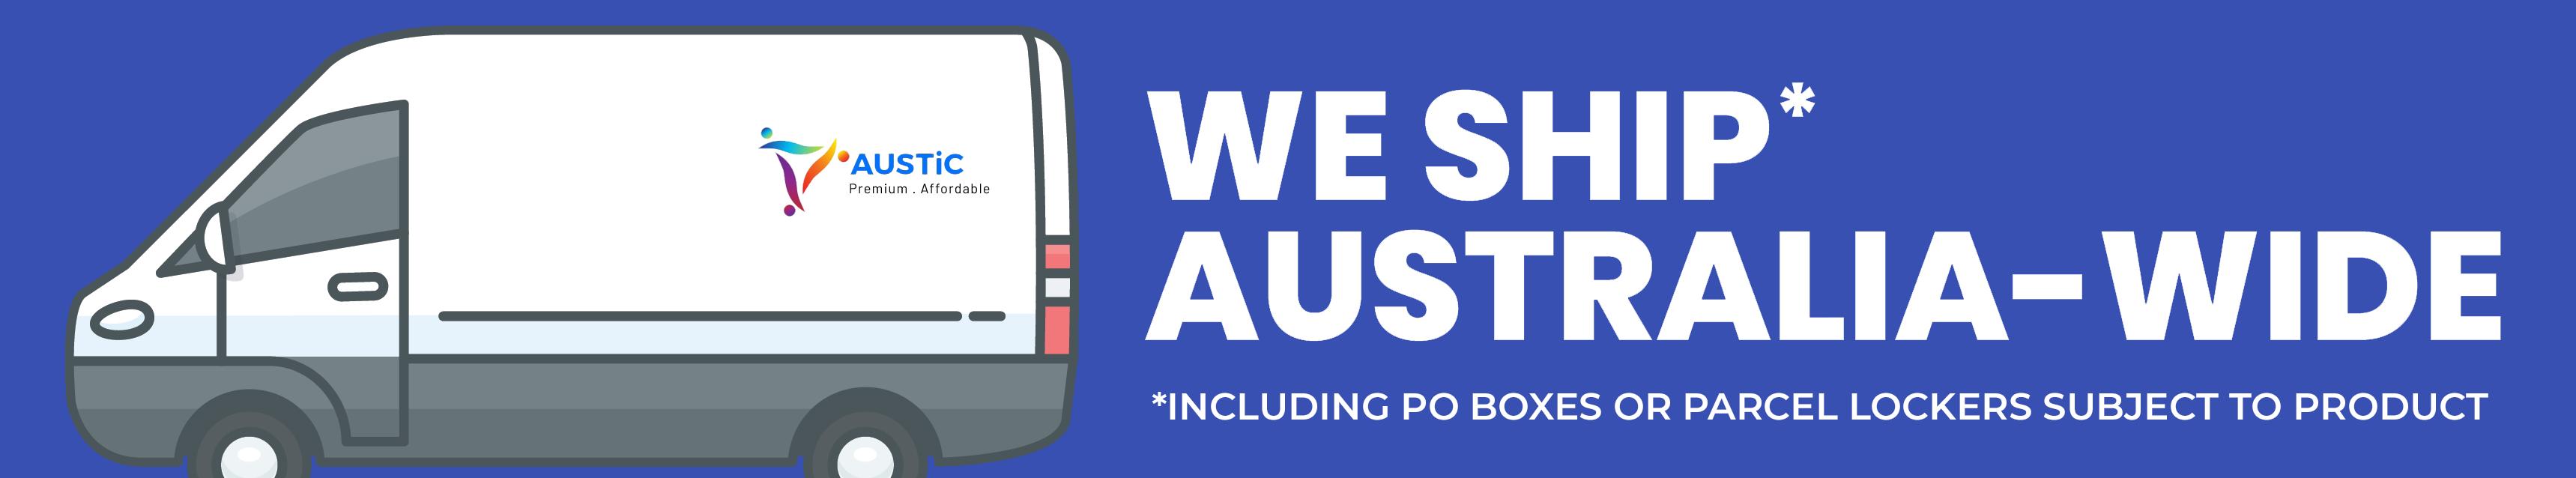 We ship Australia-wide